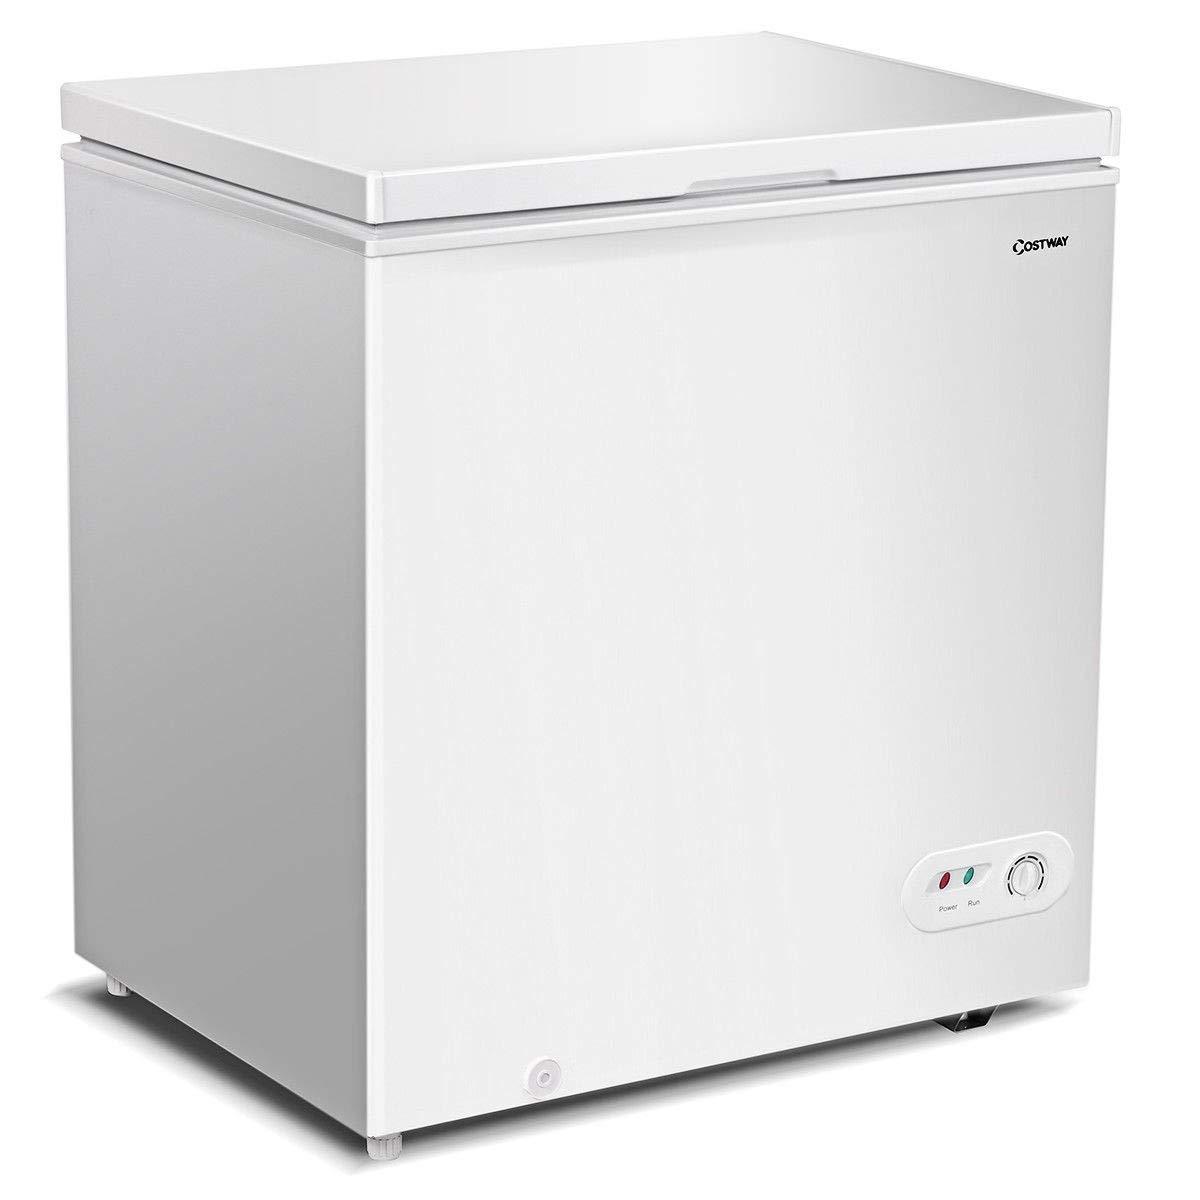 5.2 CU. FT Single Door Household Compact Chest Freezer New Perfect Beautiful Classic Elegant Useful CHOOSEandBUY